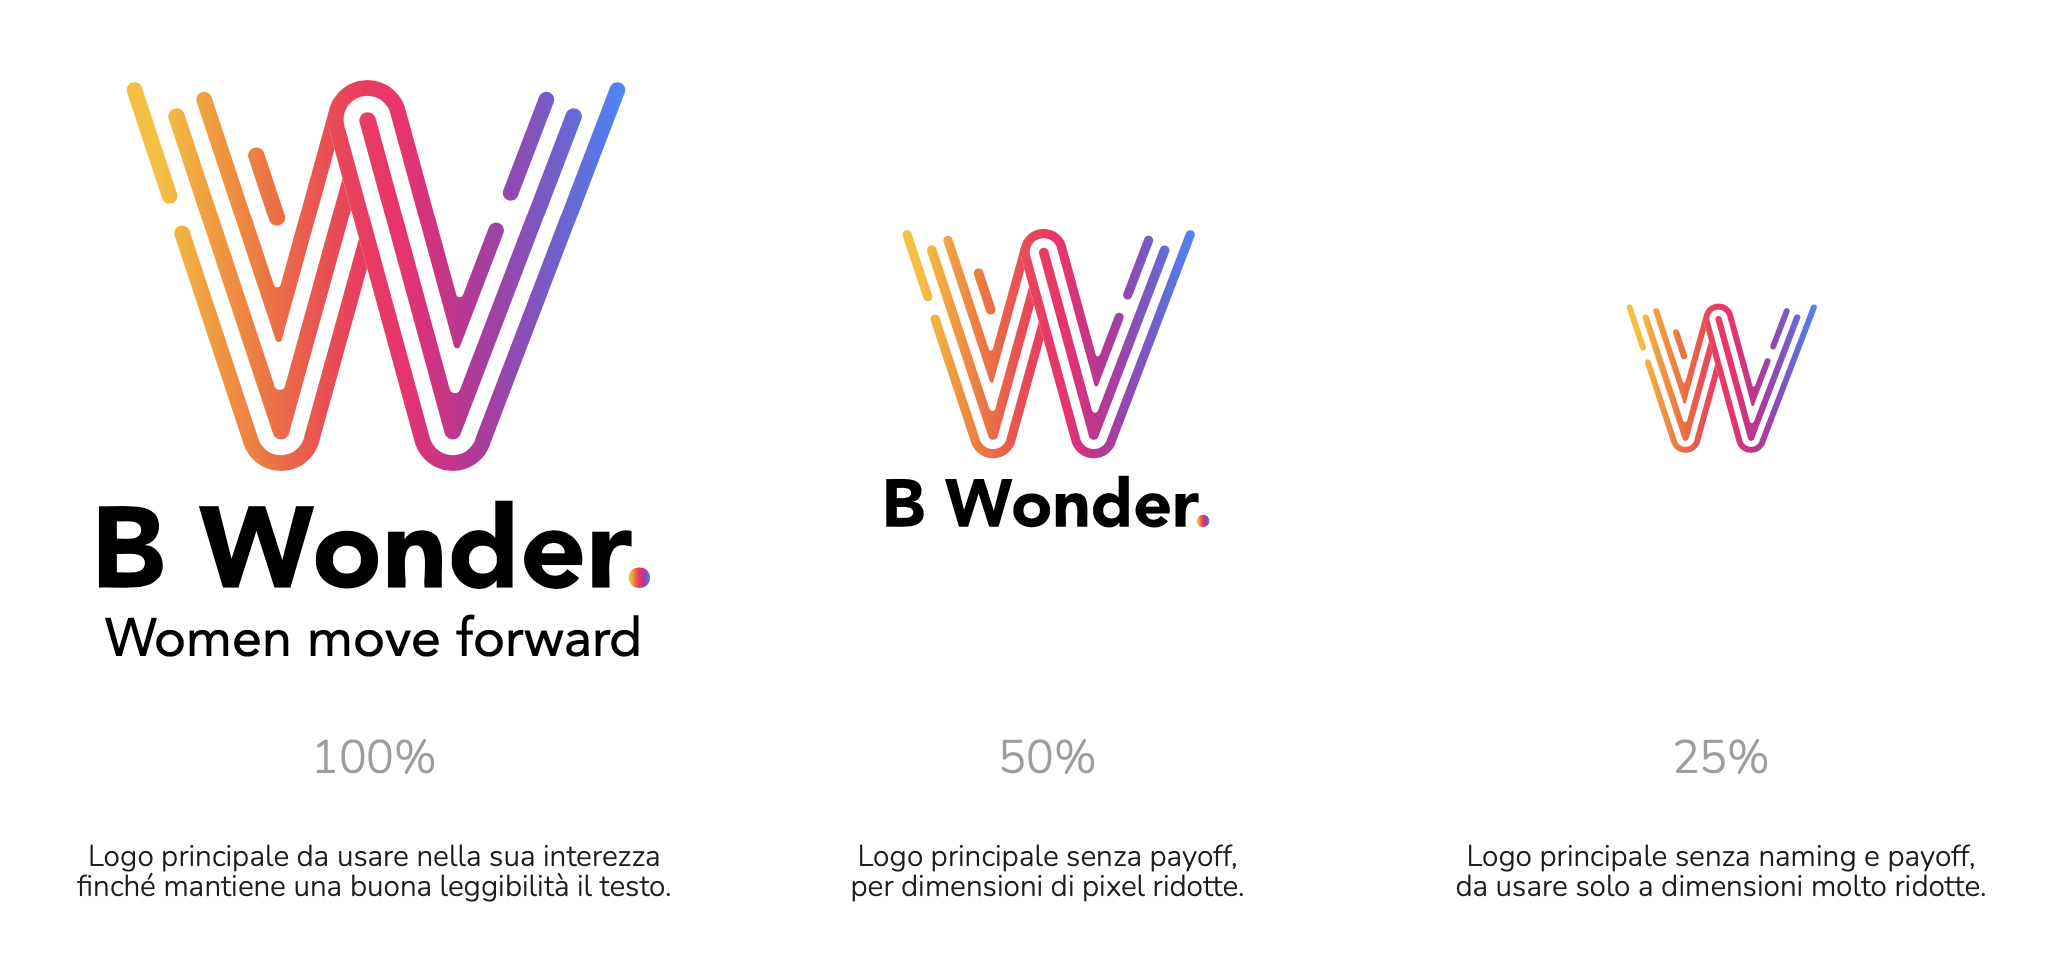 Uso marchio B Wonder